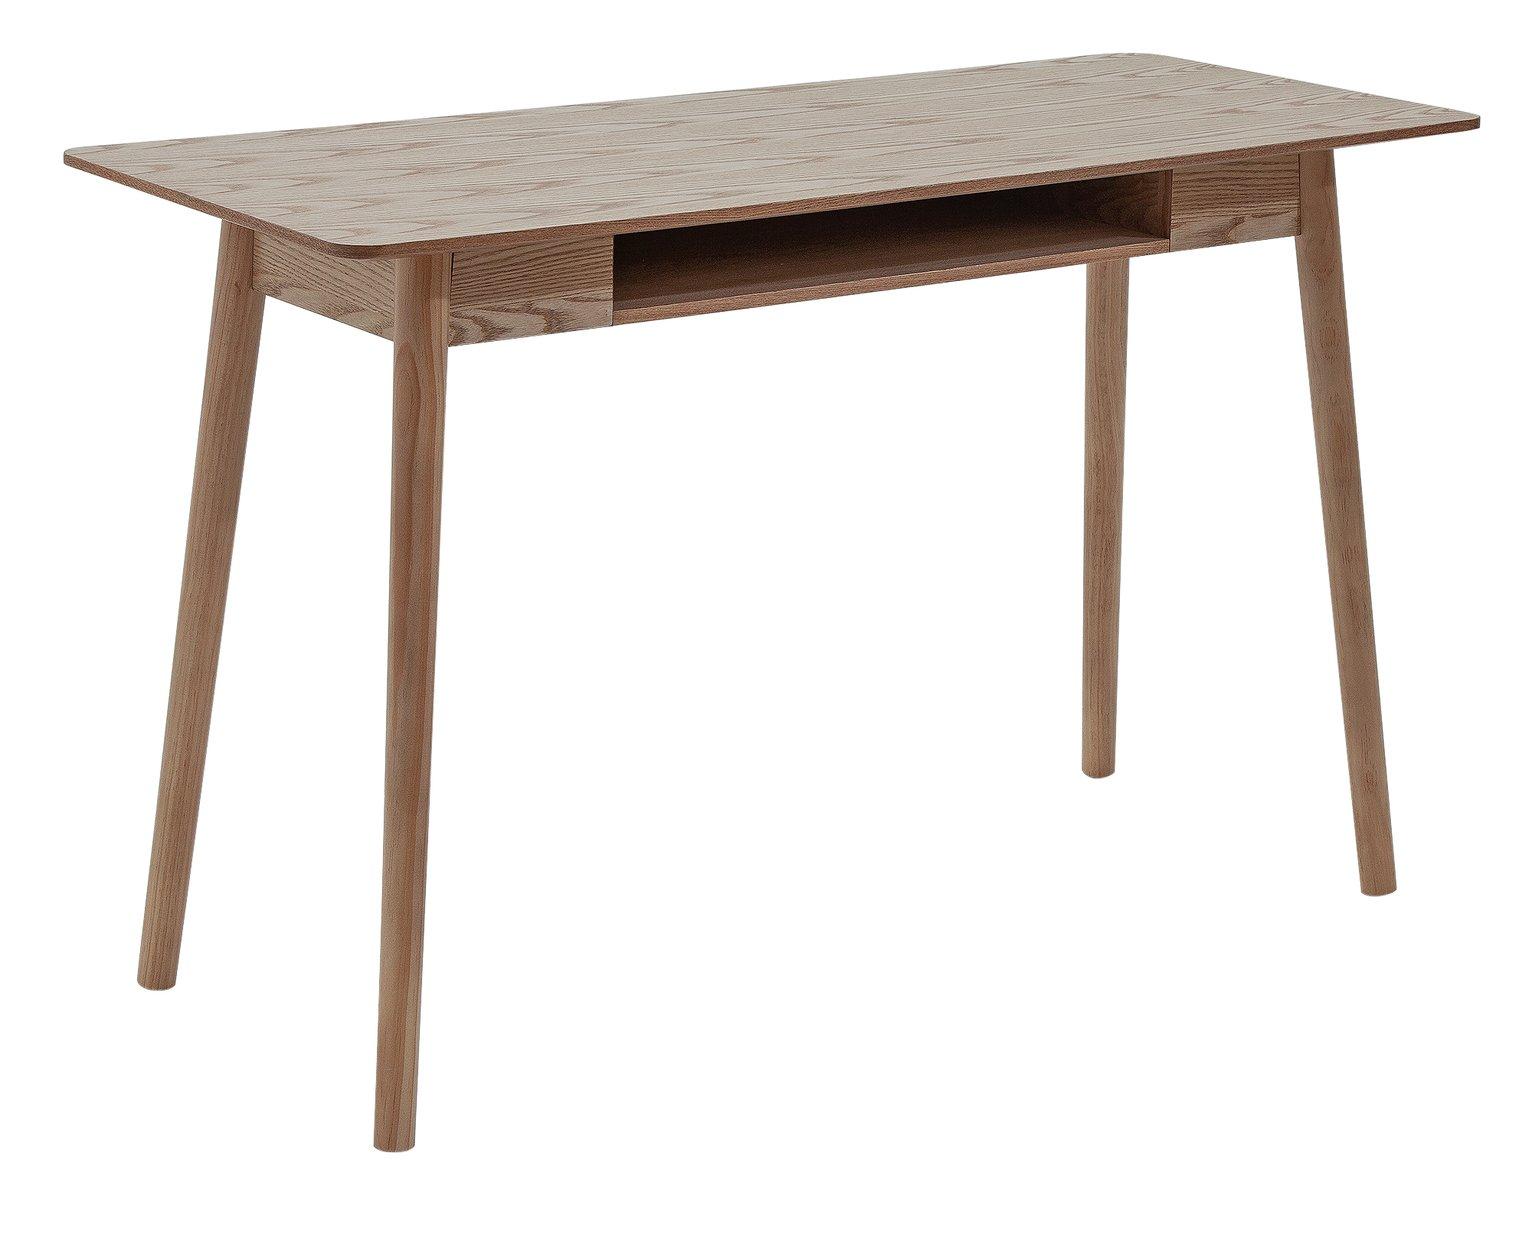 Argos Home Maja Office Desk - Ash